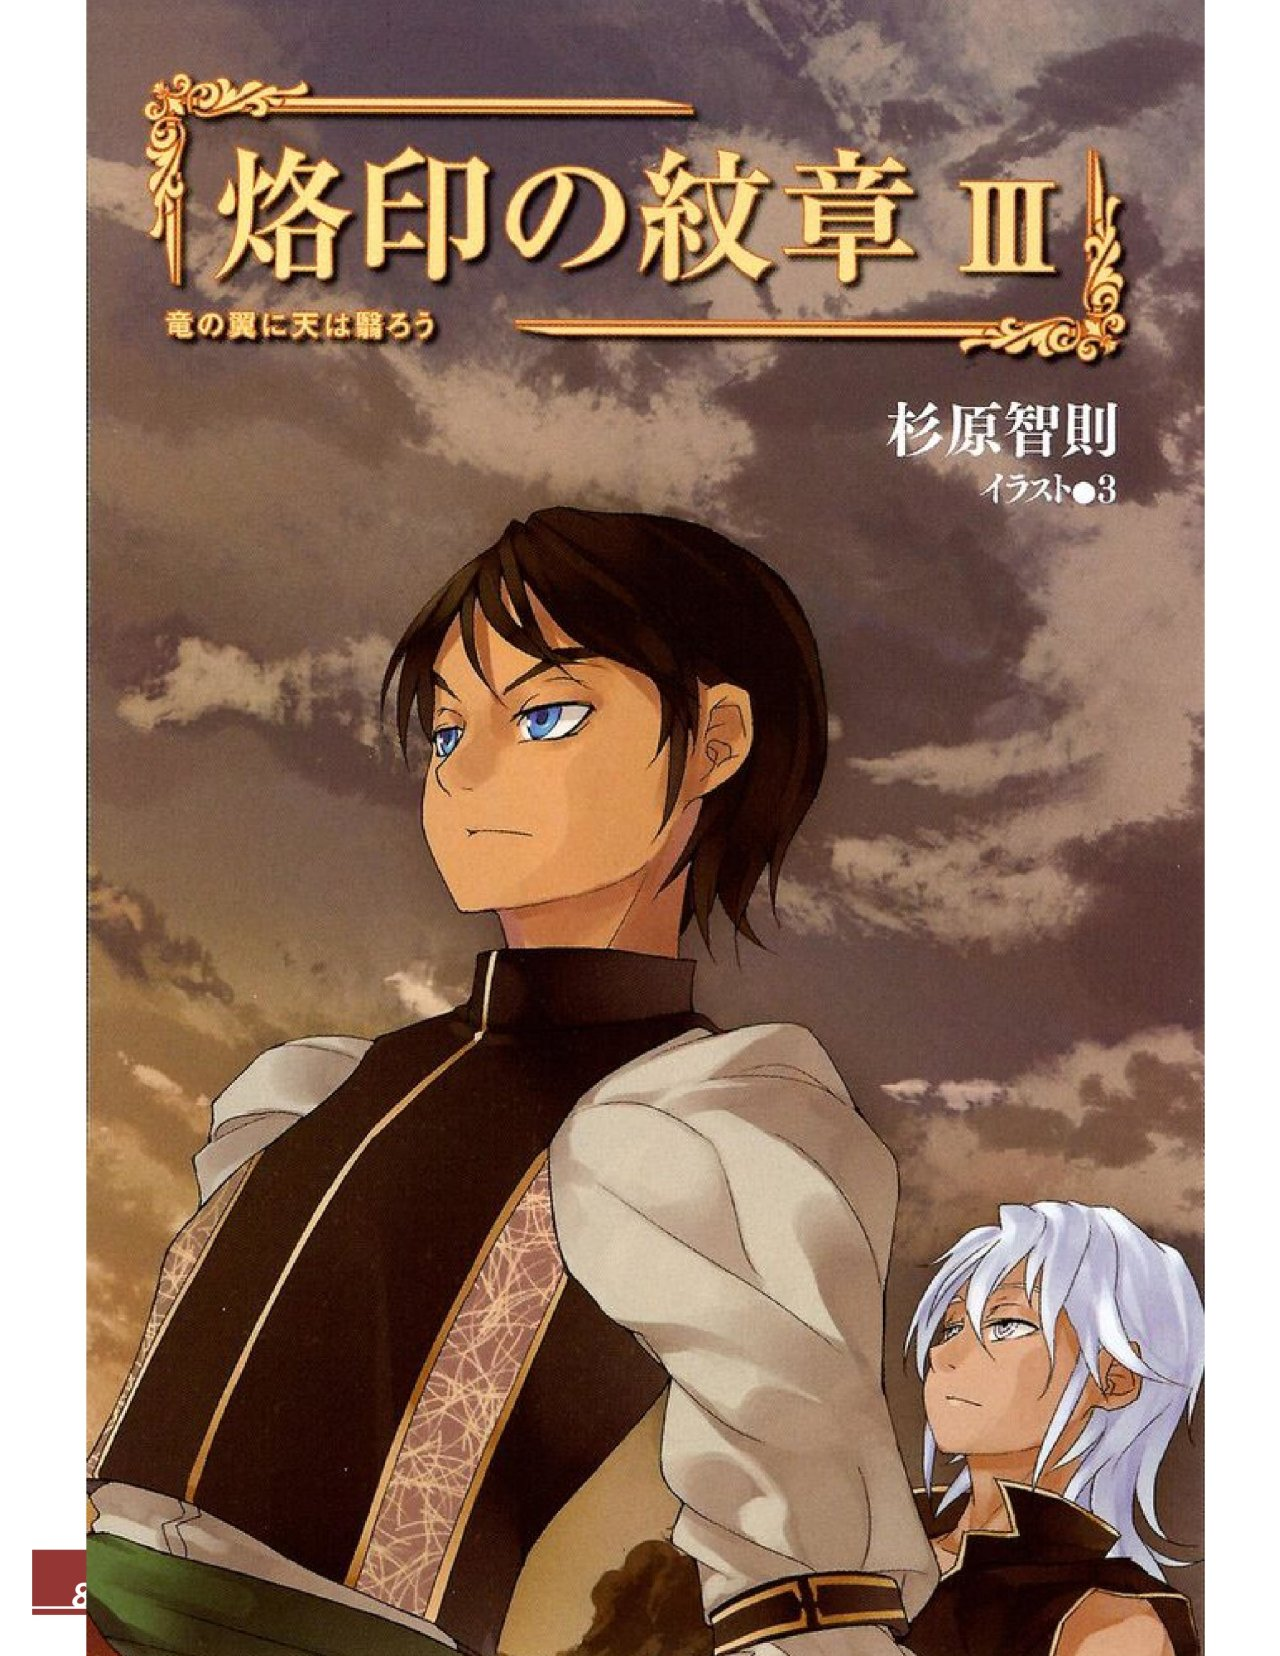 https://c9.mangatag.com/es_manga/pic5/22/25558/727844/f5ca5e77fac3302dc36d319d35c7bf65.jpg Page 8